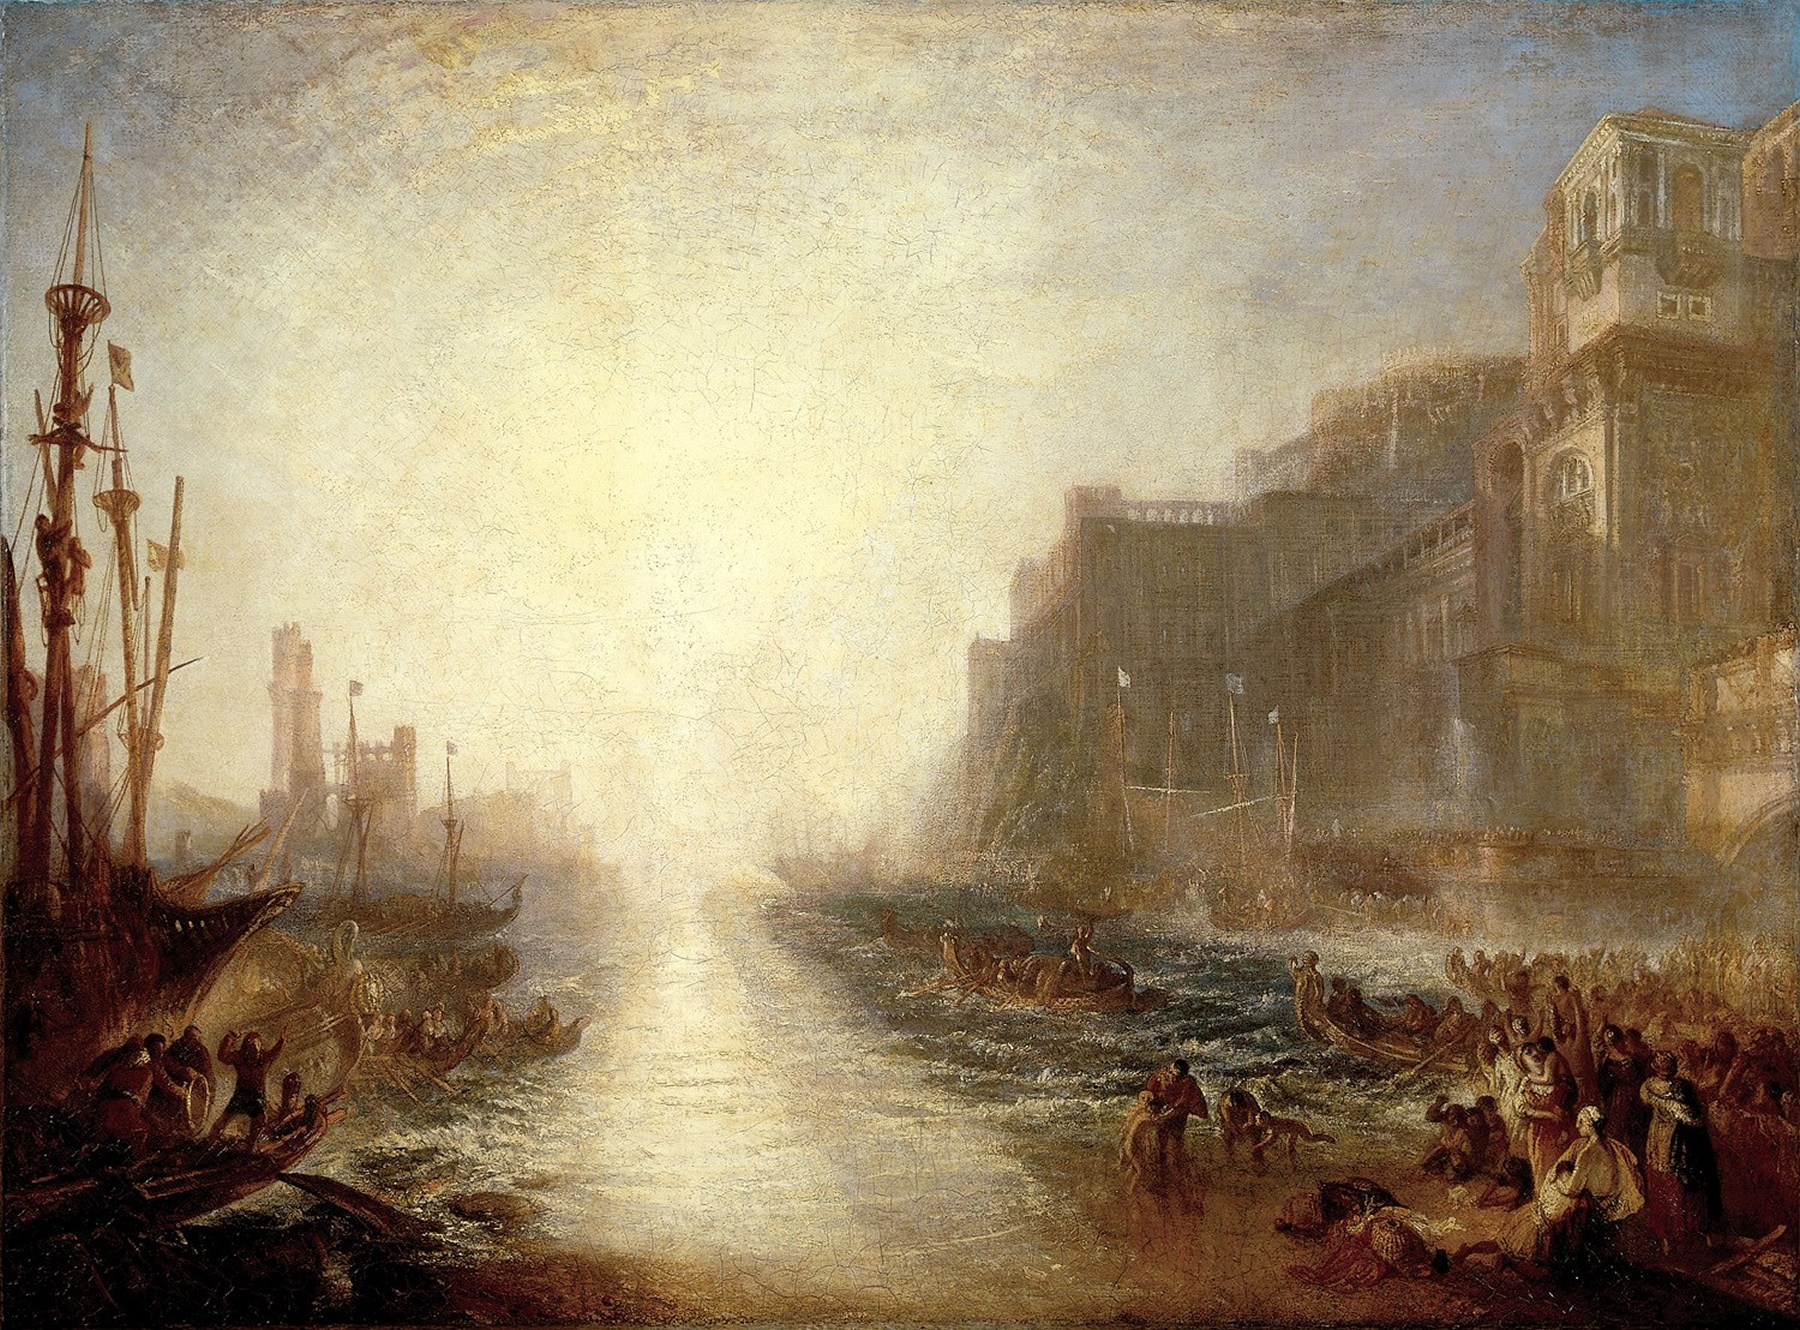 картина < Регул, отправляющийся в поход из Рима >:: Уильям Тёрнер ( William Turner ) - Тёрнер Уйльям фото